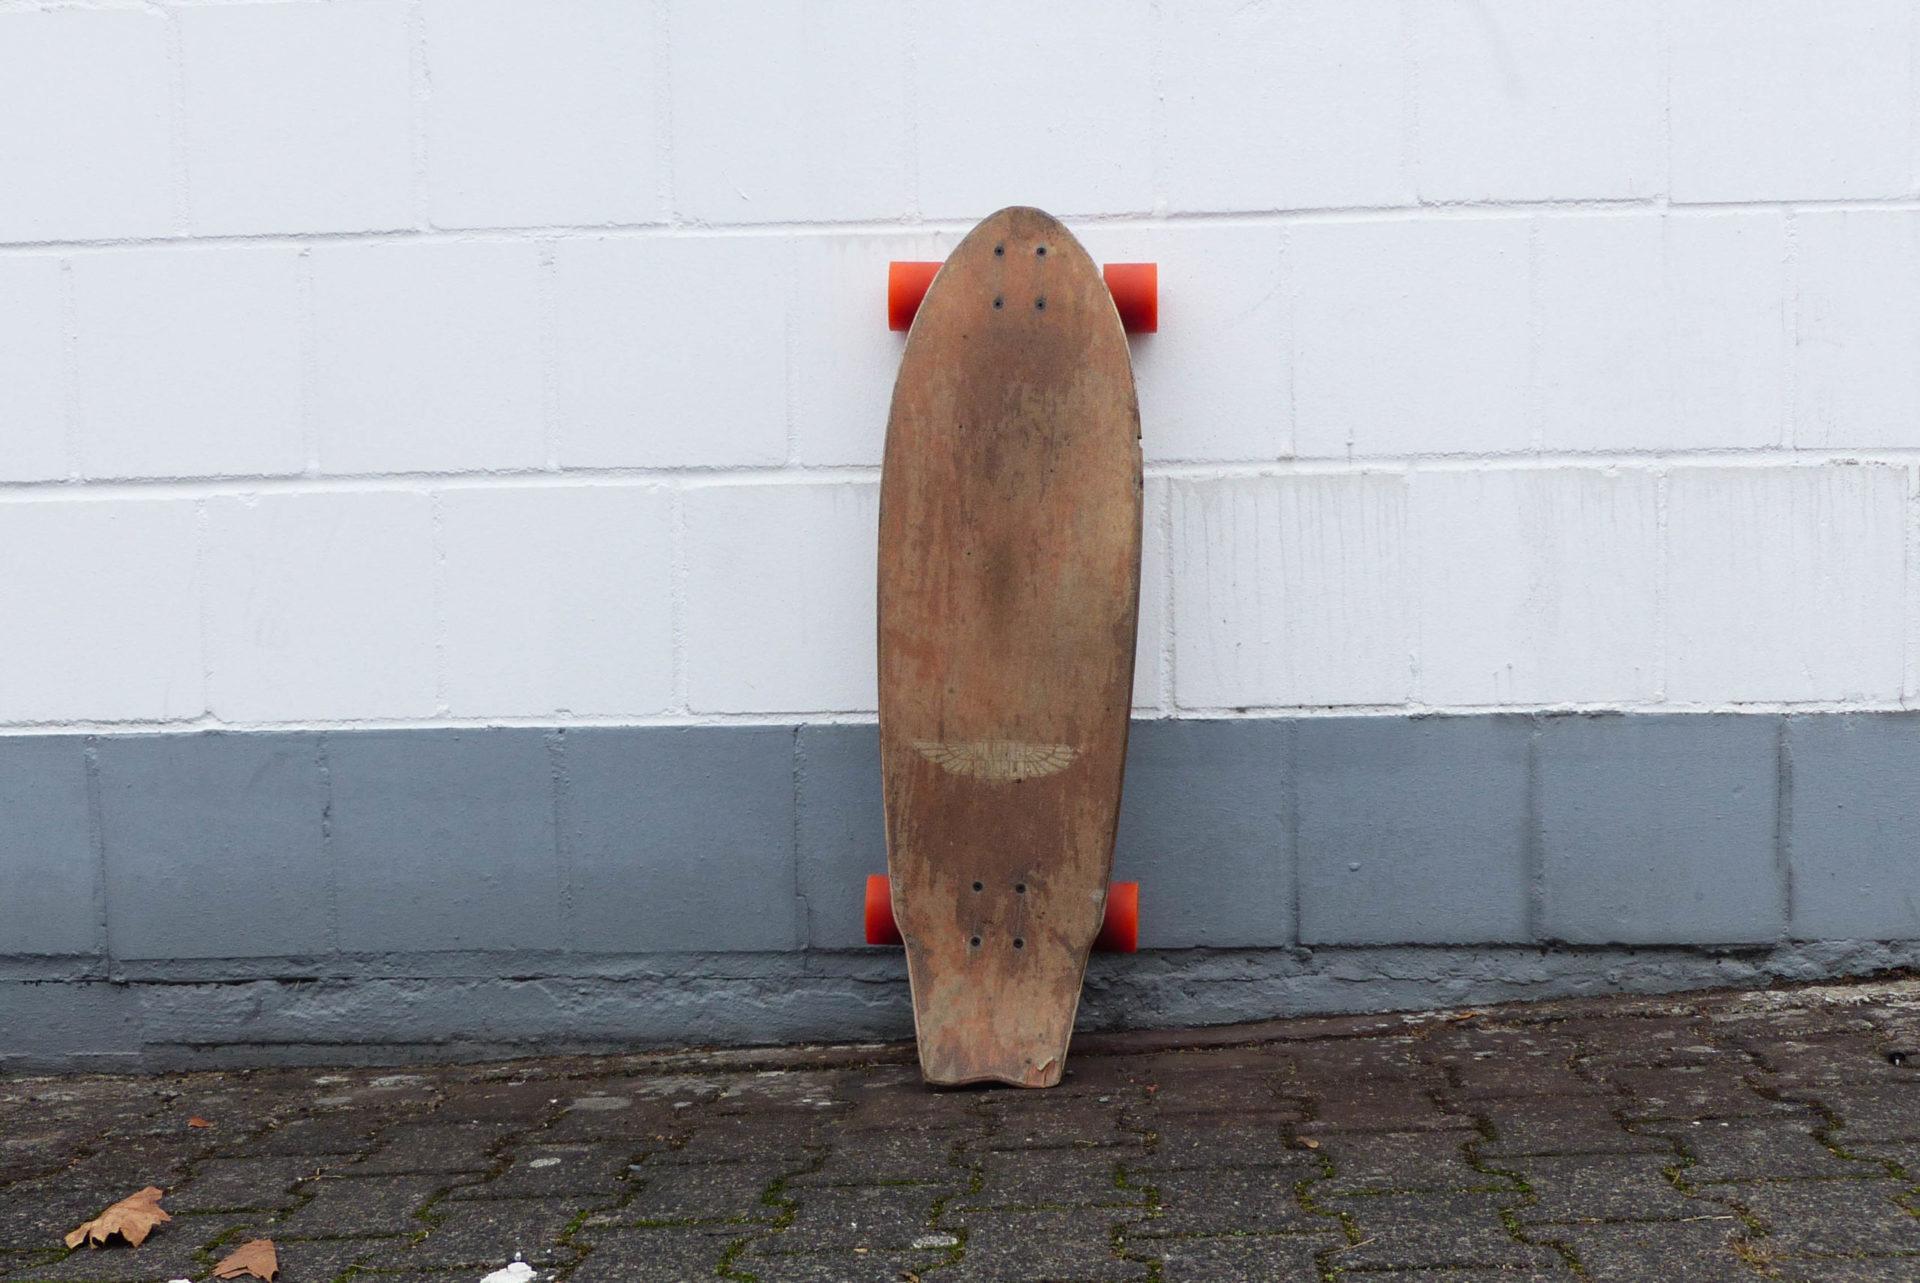 Longboard lehnt an Hauswand